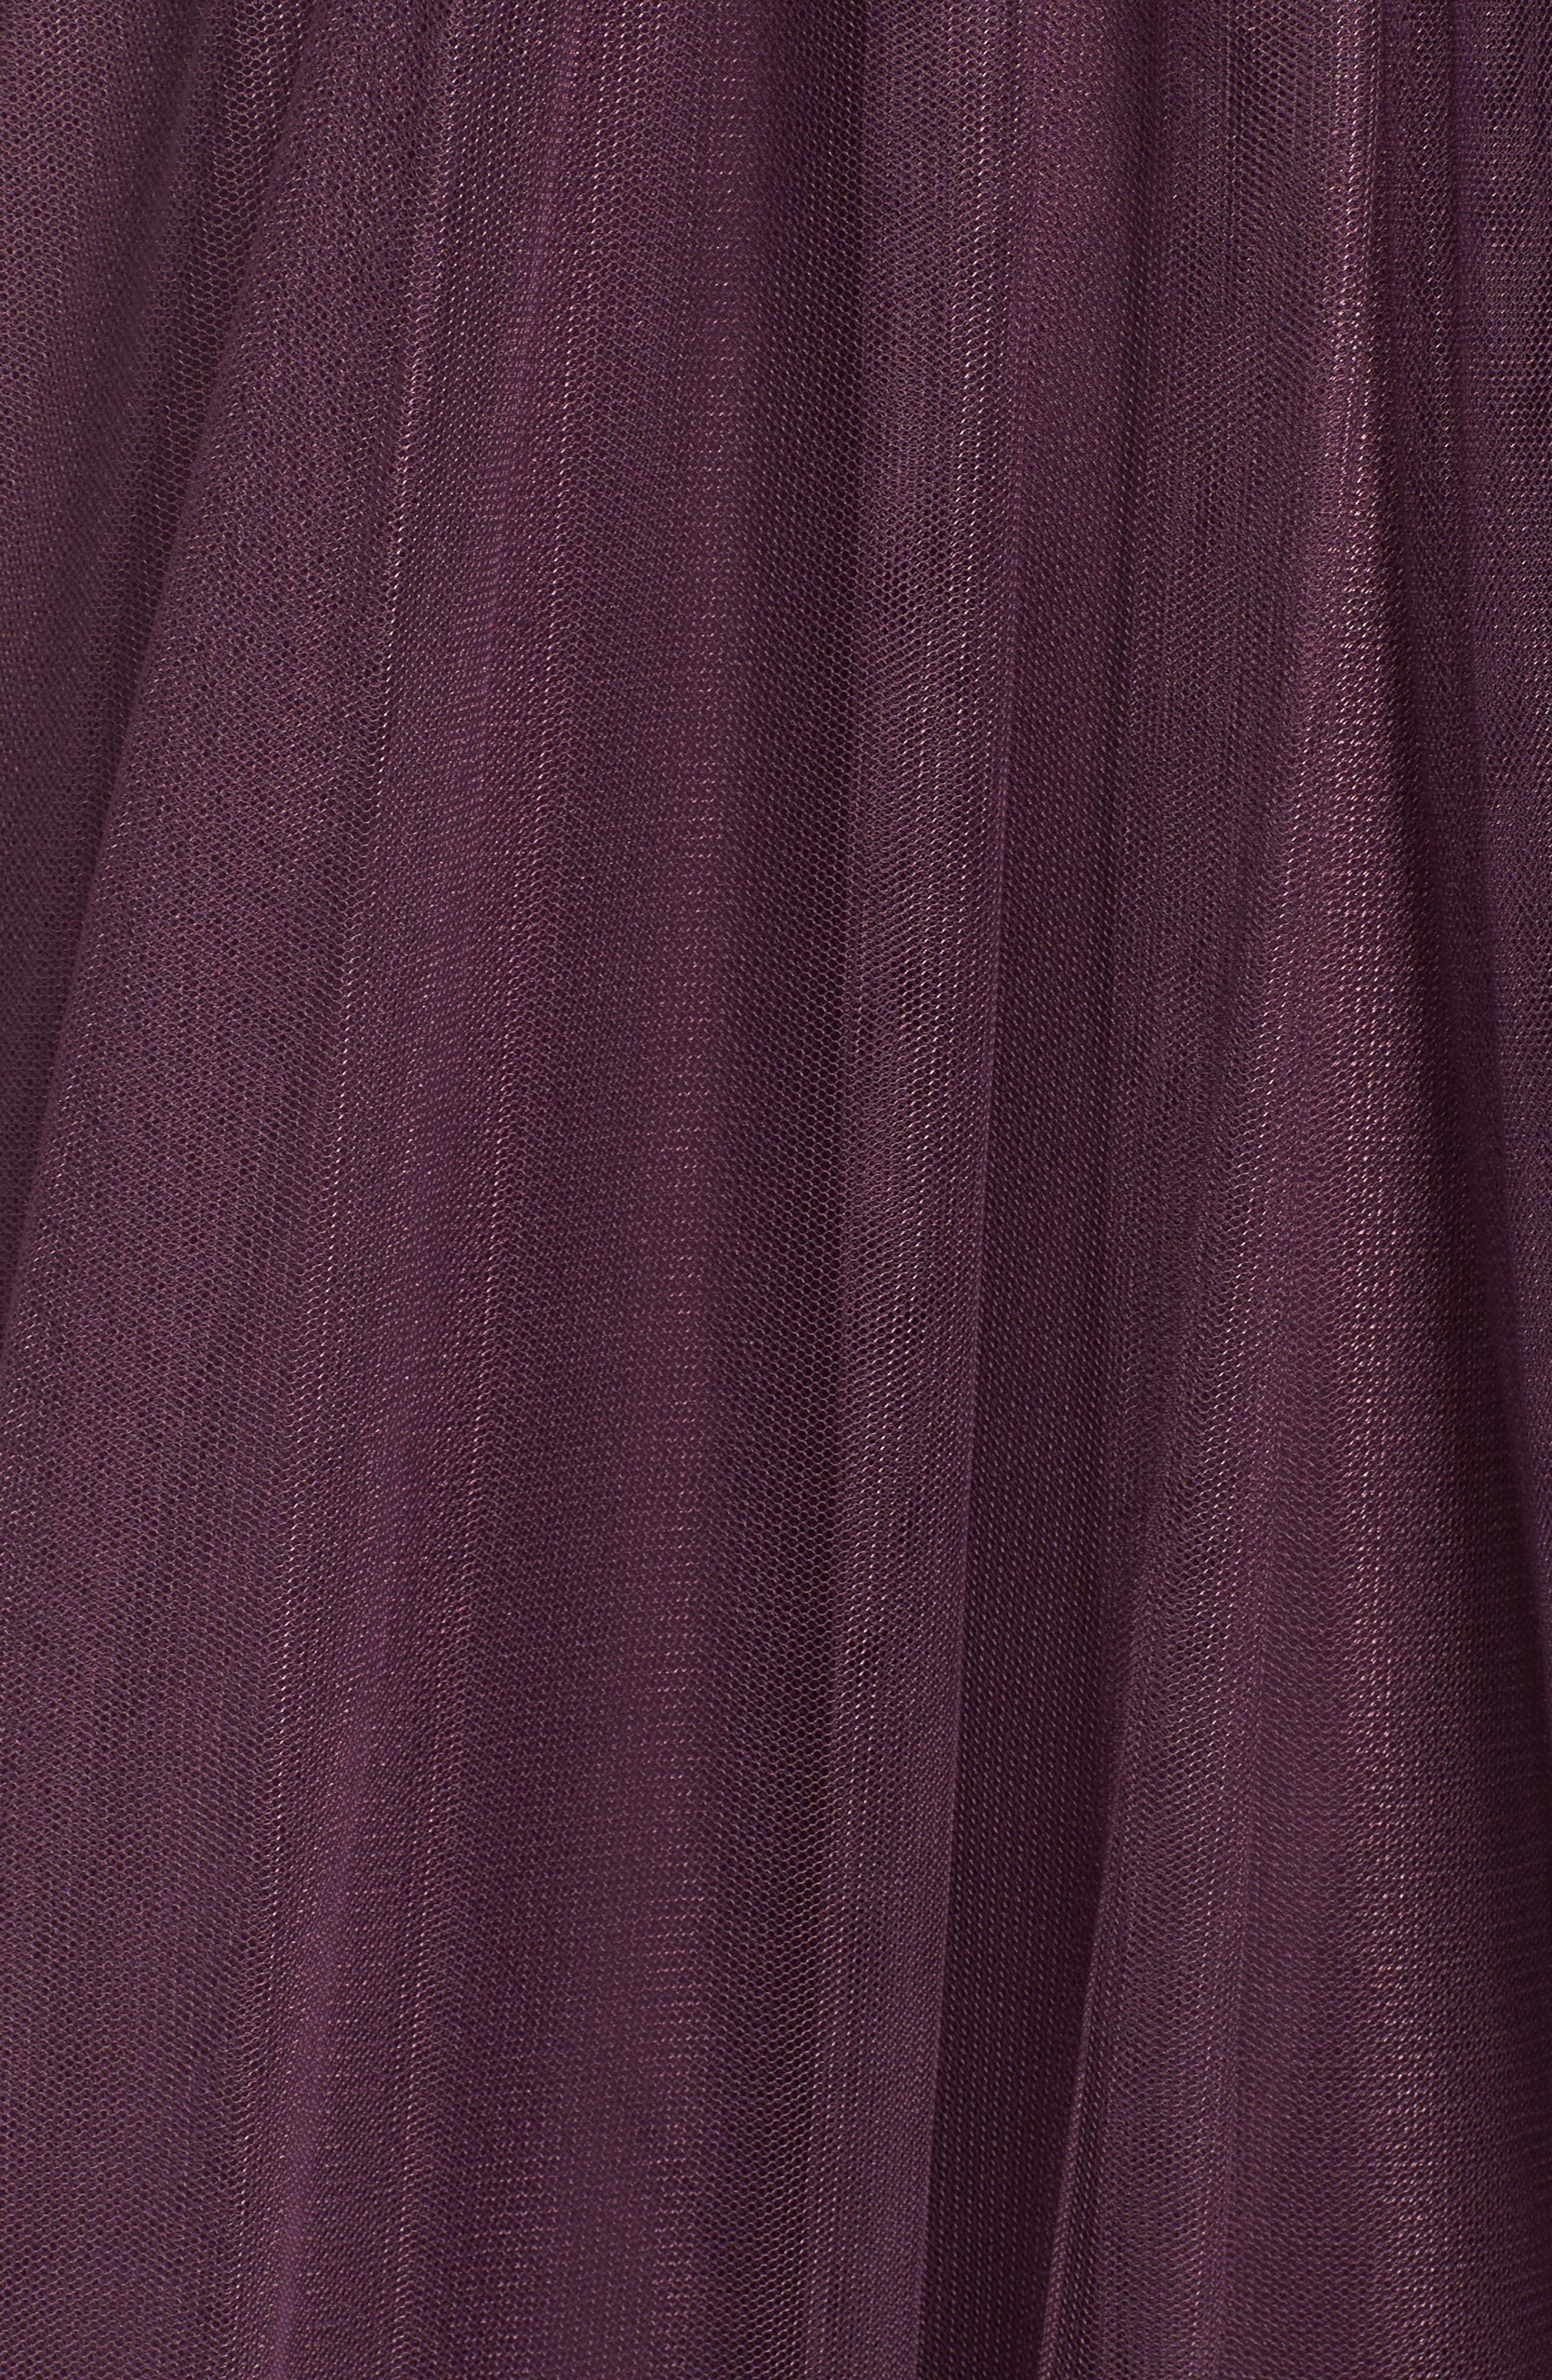 Annabelle Convertible Tulle Column Dress,                             Alternate thumbnail 5, color,                             Raisin